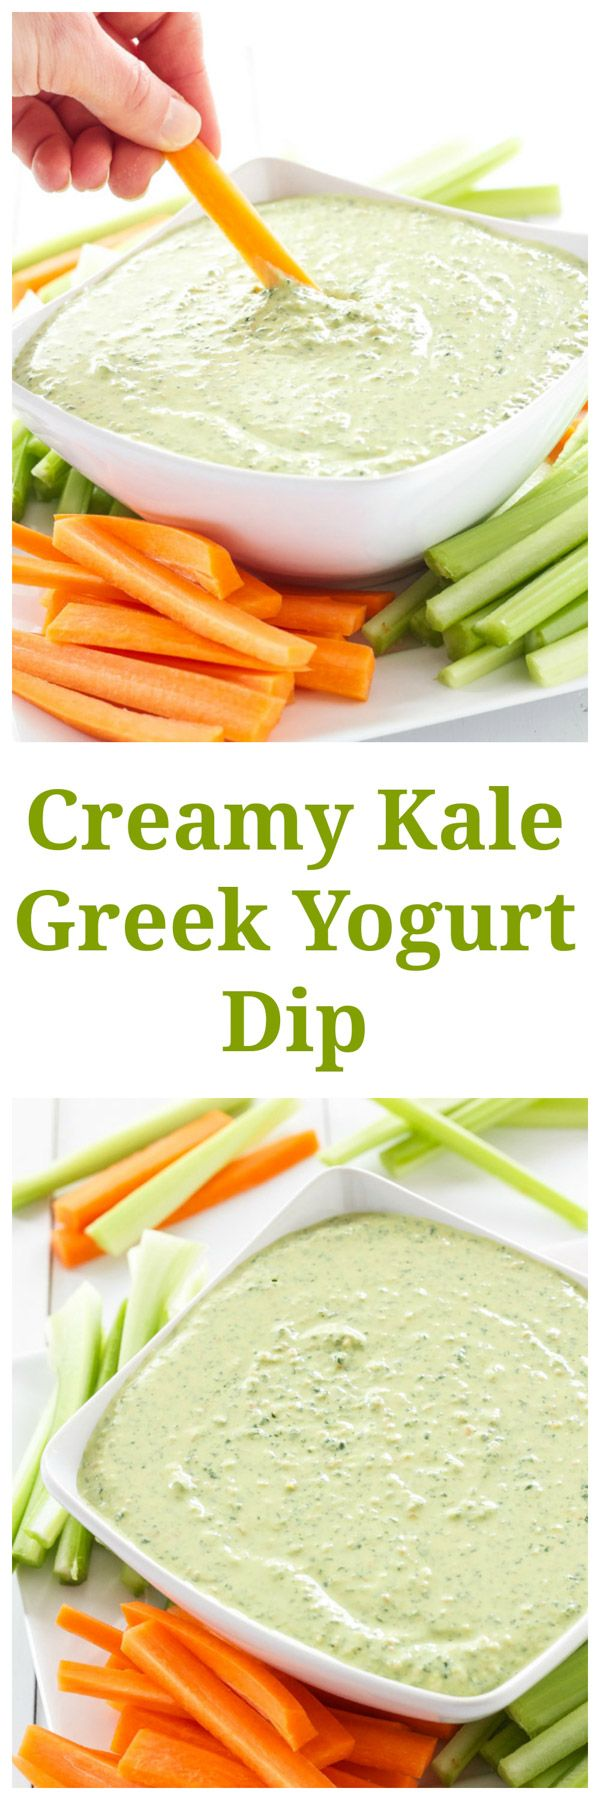 Creamy Kale Greek Yogurt Dip | Finally a dip you can feel good about eating! | www.reciperunner.com